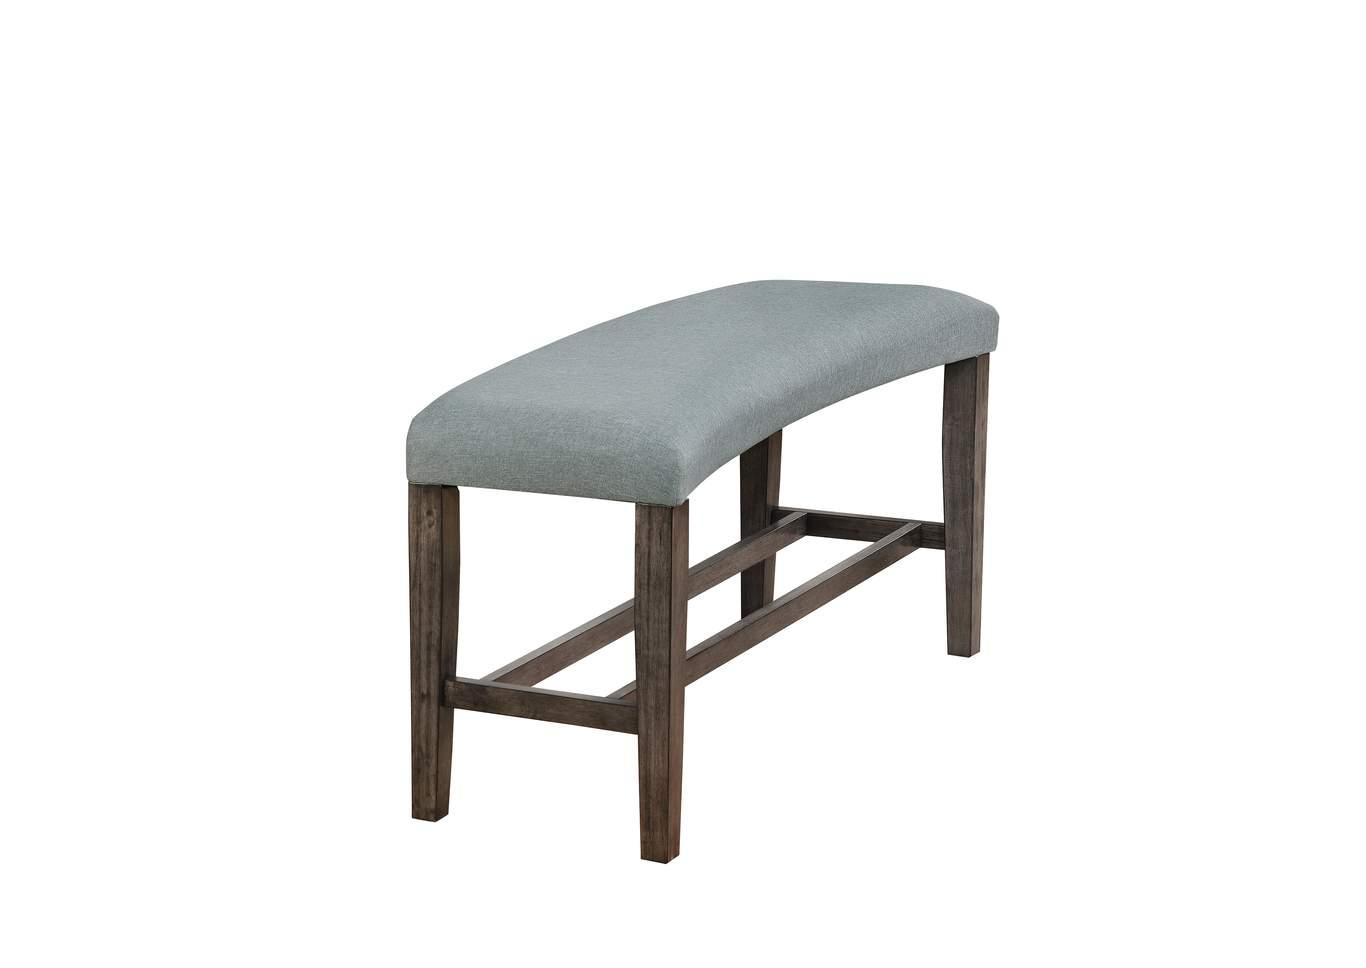 Hollis Grey Upholstered Dining Bench,Crown Mark